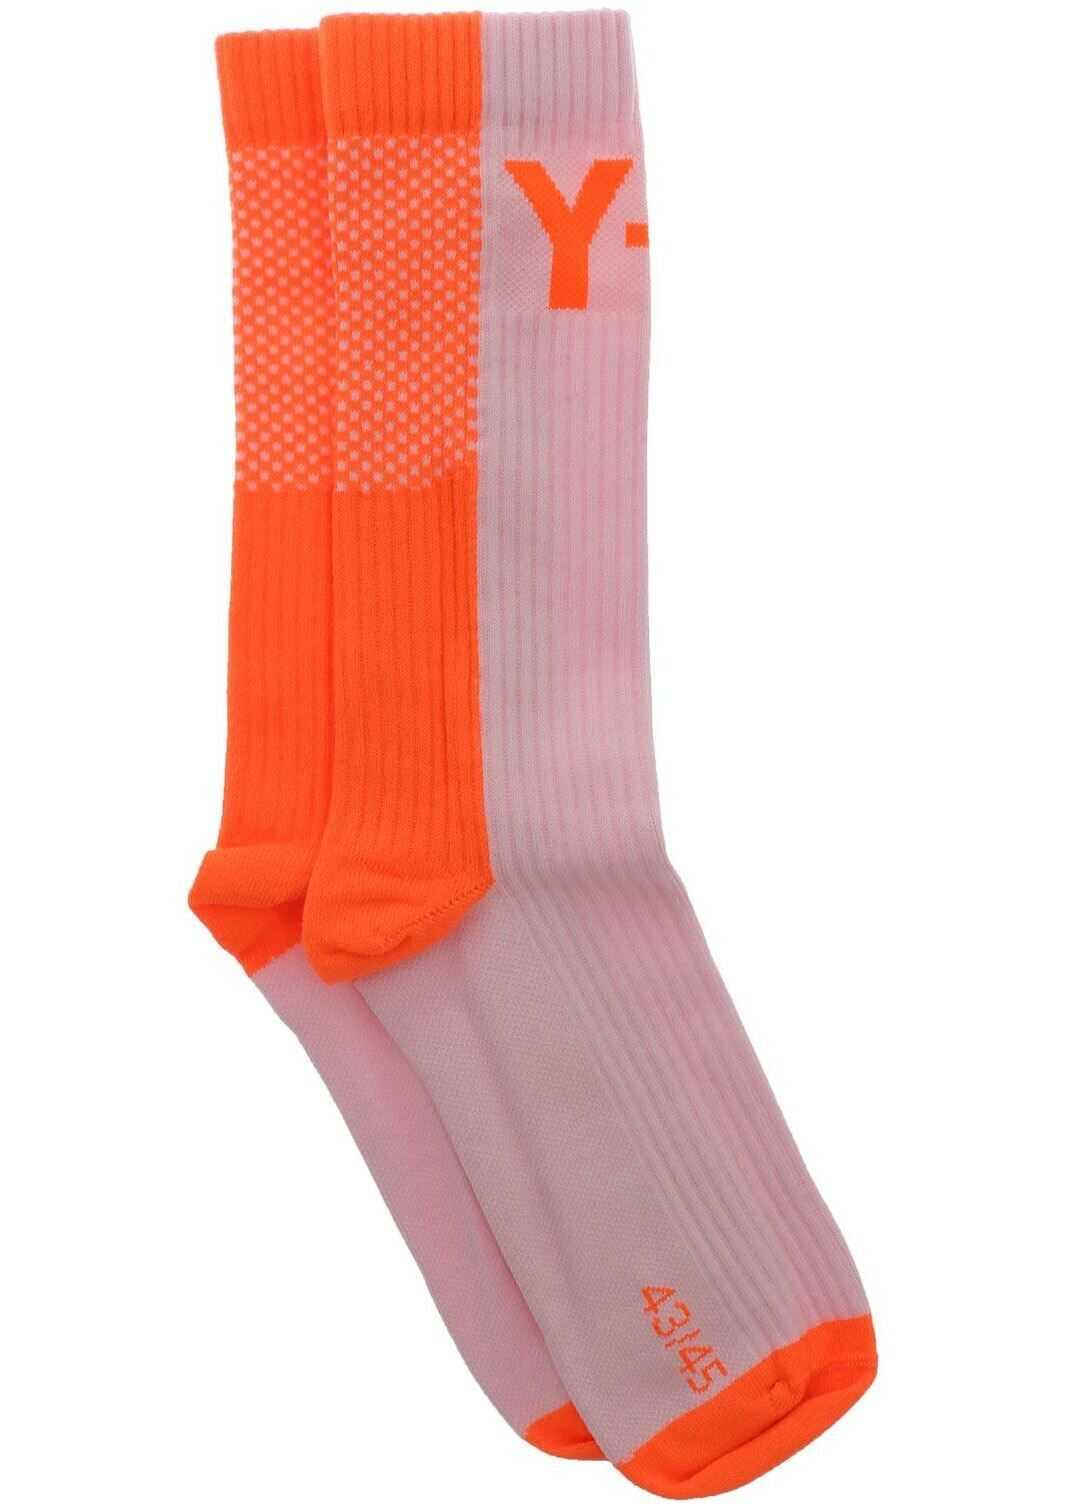 Y-3 Socks In Pink And Orange Fluo Pink